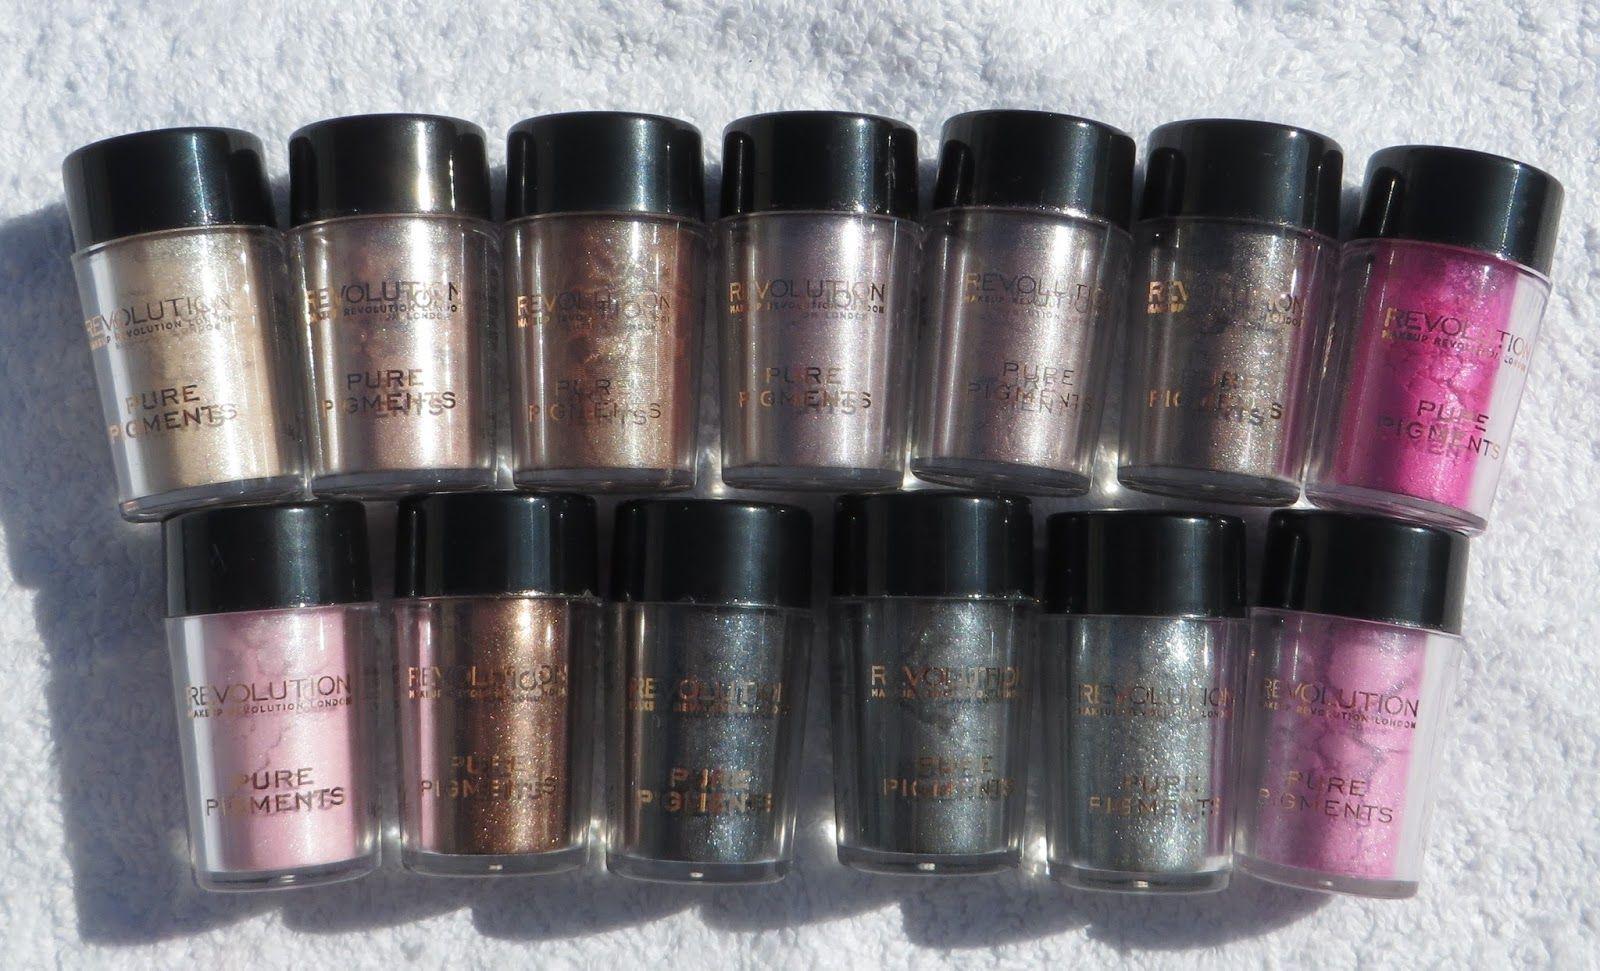 *Nina's Bargain Beauty* Makeup Revolution's Pure Pigment